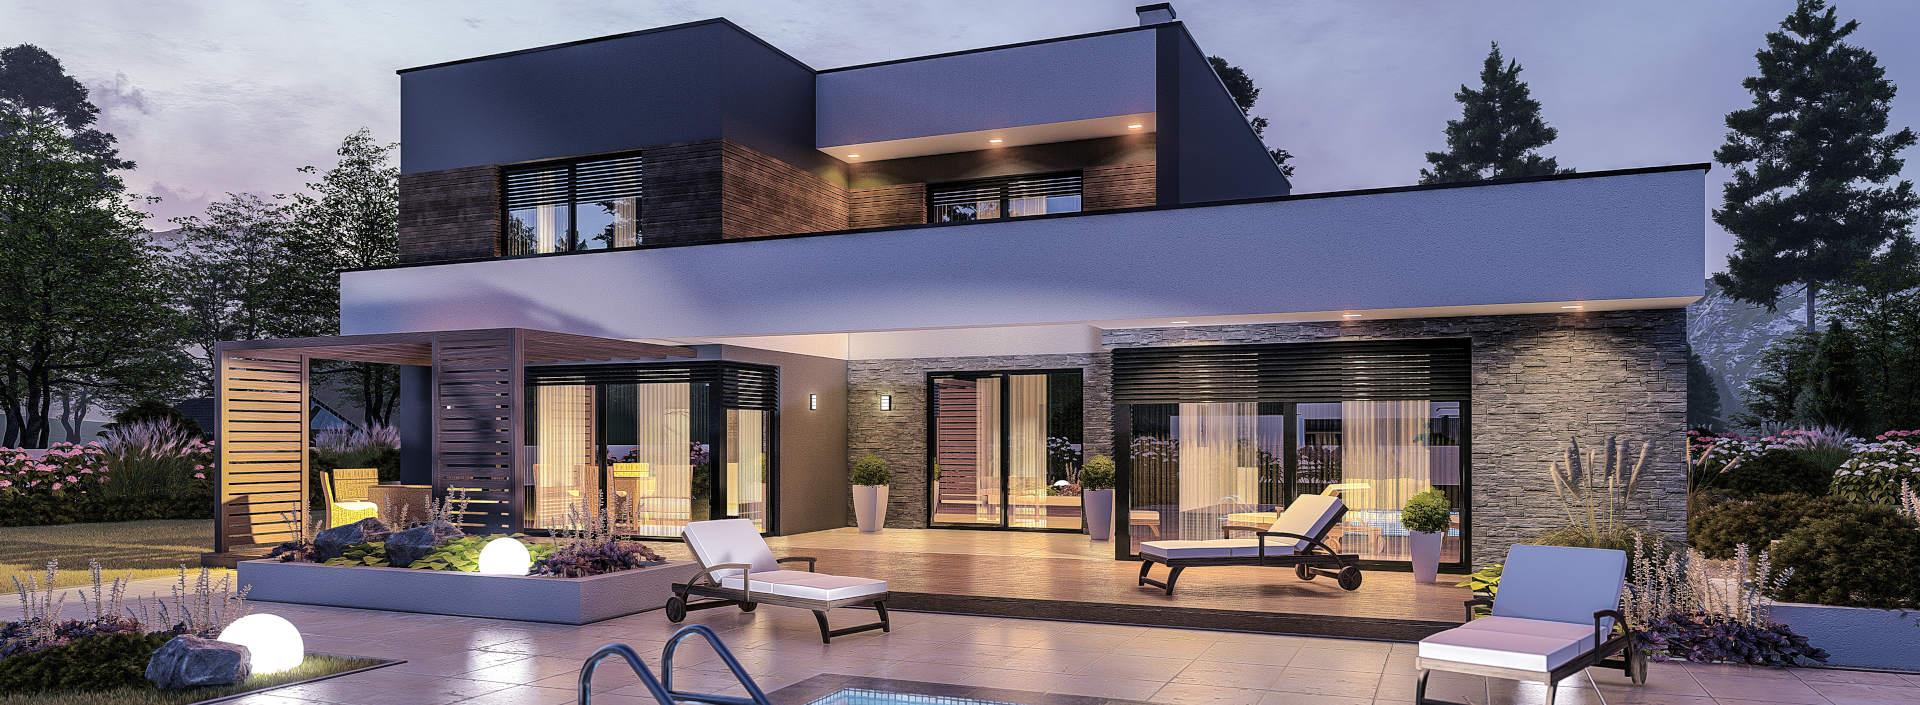 ERLIS projekty rodinných domov